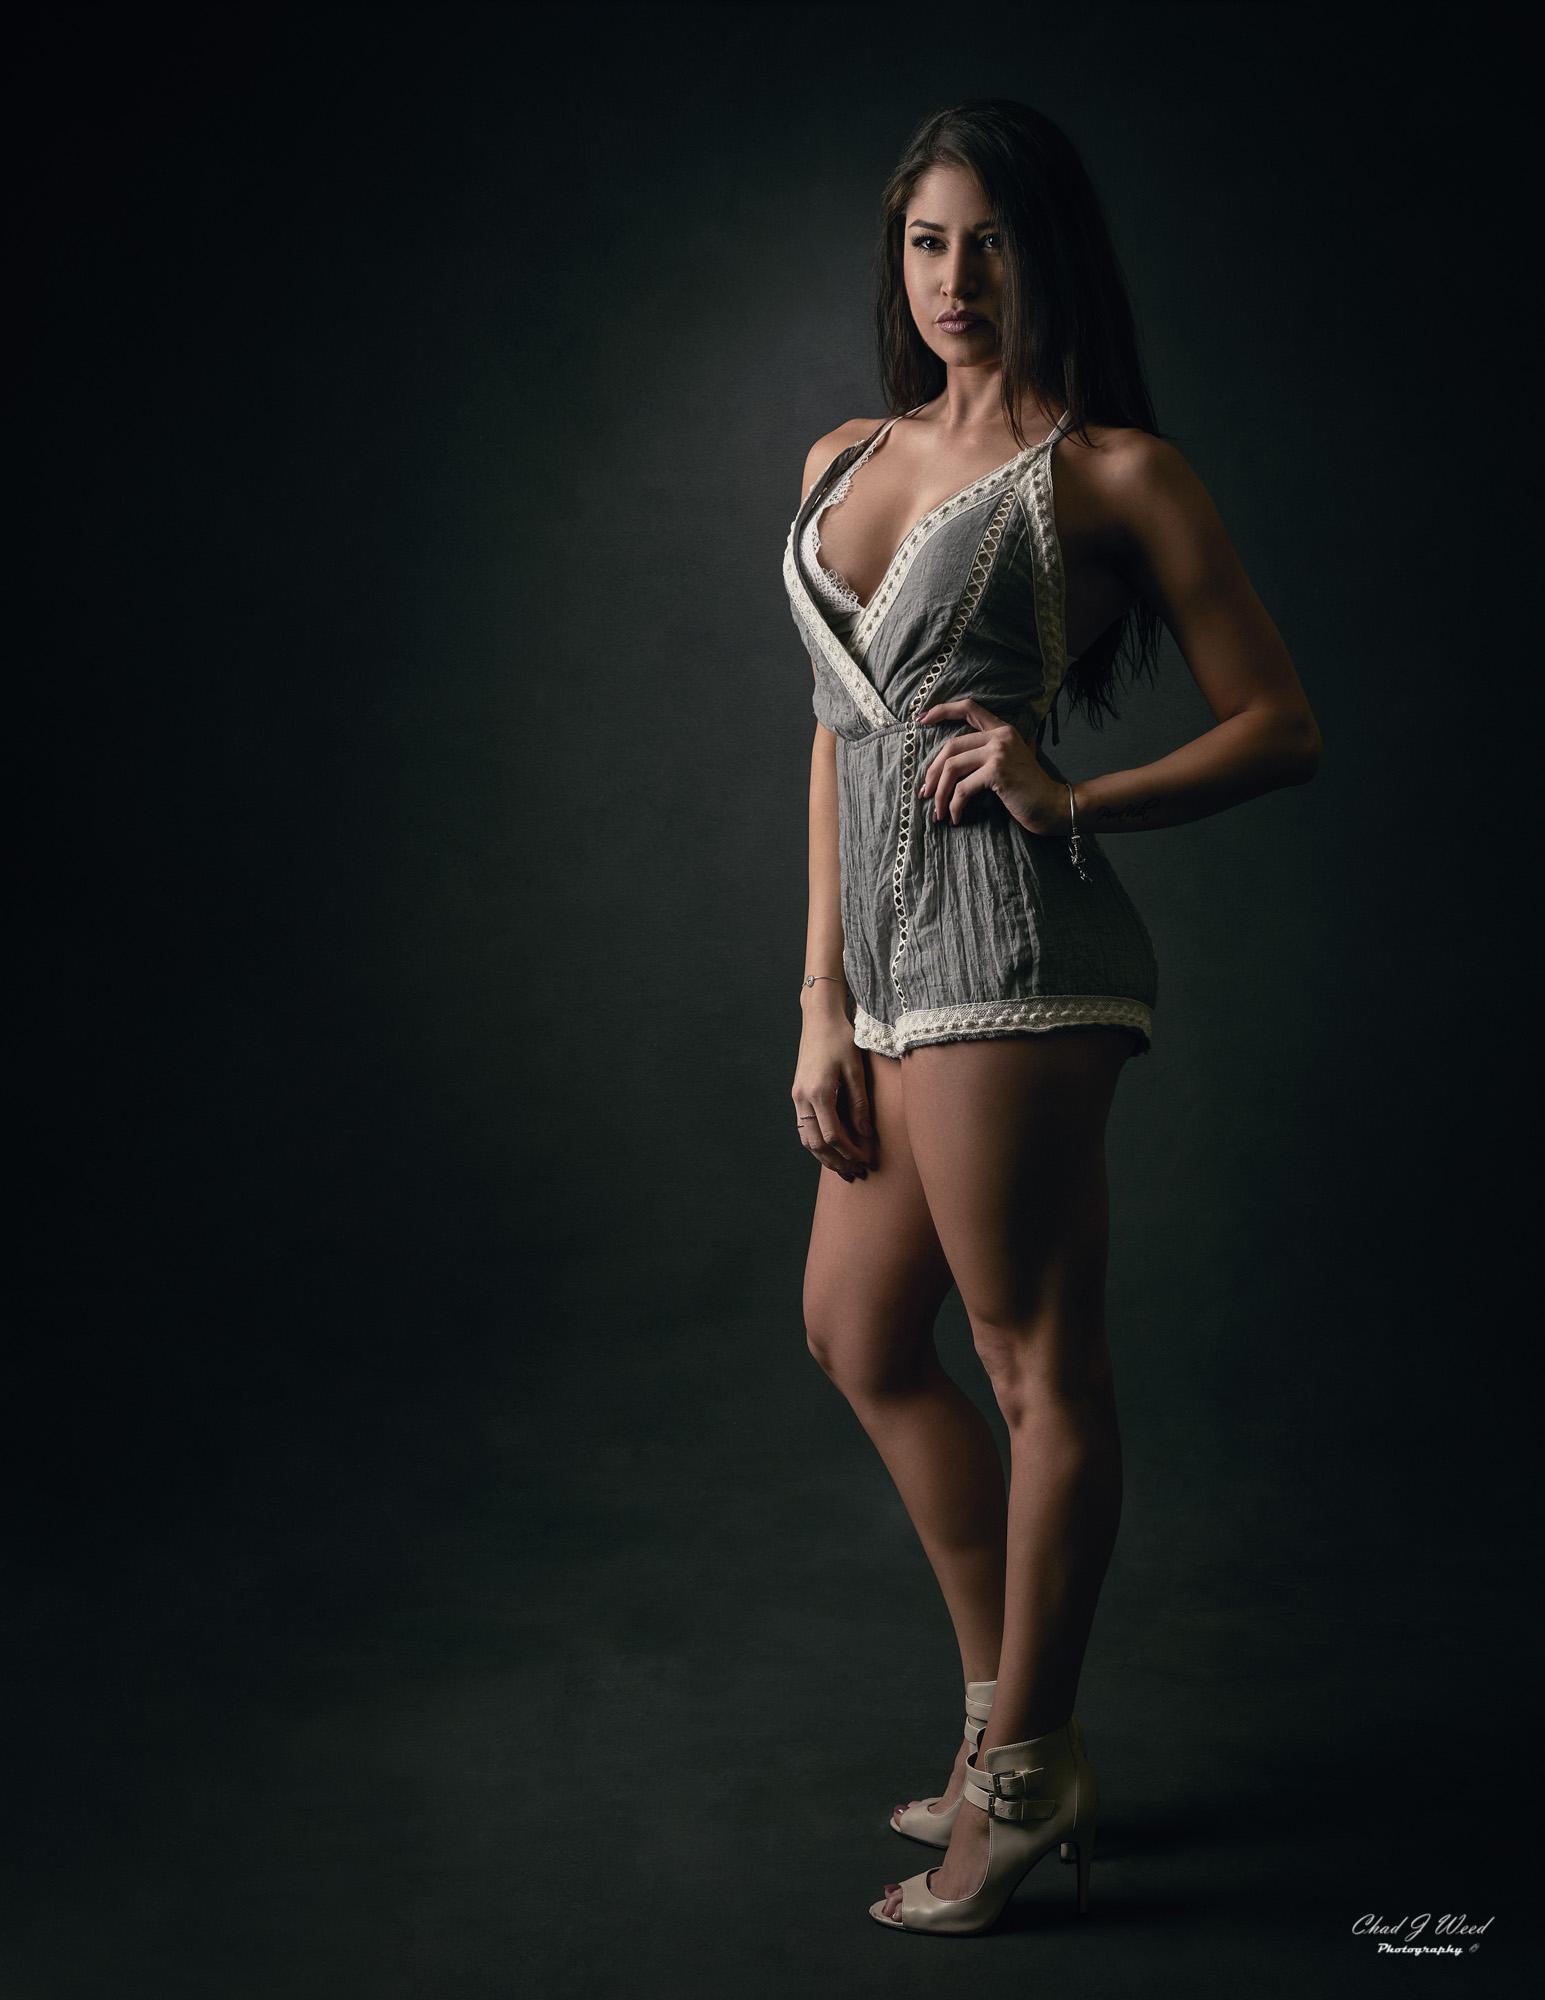 Arizona Fashion Photographer Chad Weed with Fitness Model Ashly 3